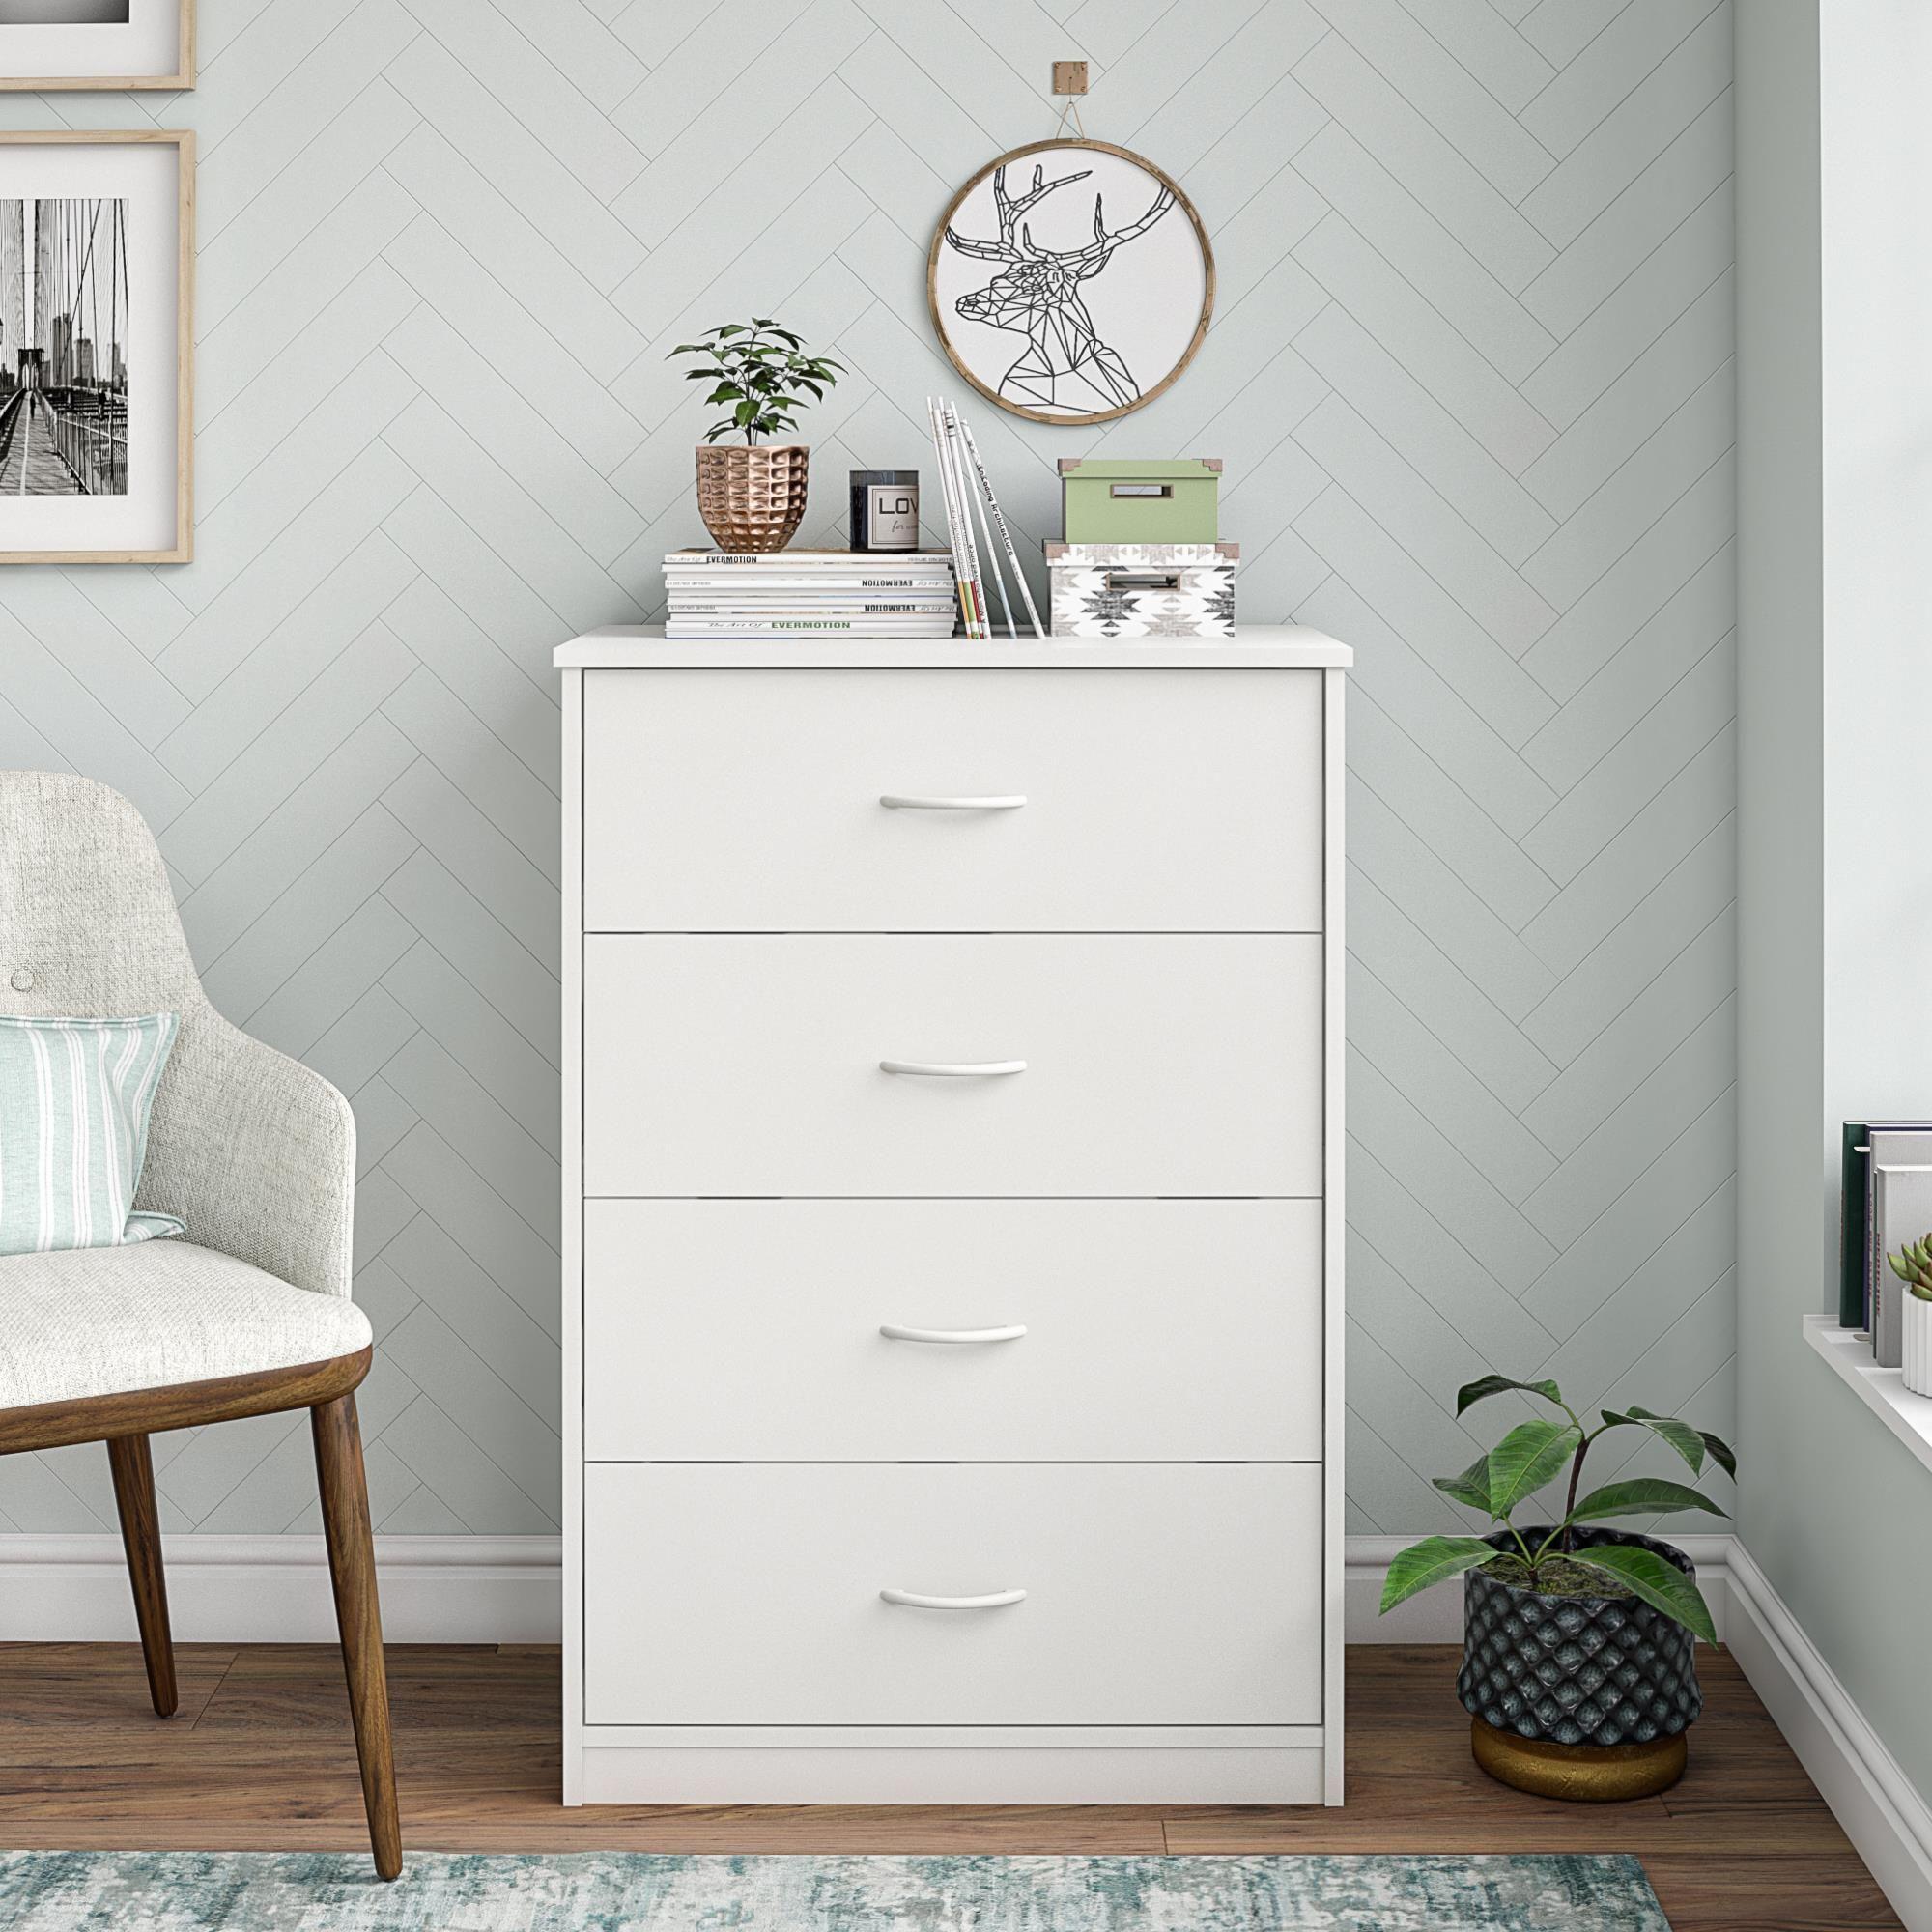 Mainstays Classic 4 Drawer Dresser White Finish Walmart Com White Dresser Decor Dresser Decor Bedroom White Dresser Bedroom [ 2000 x 2000 Pixel ]